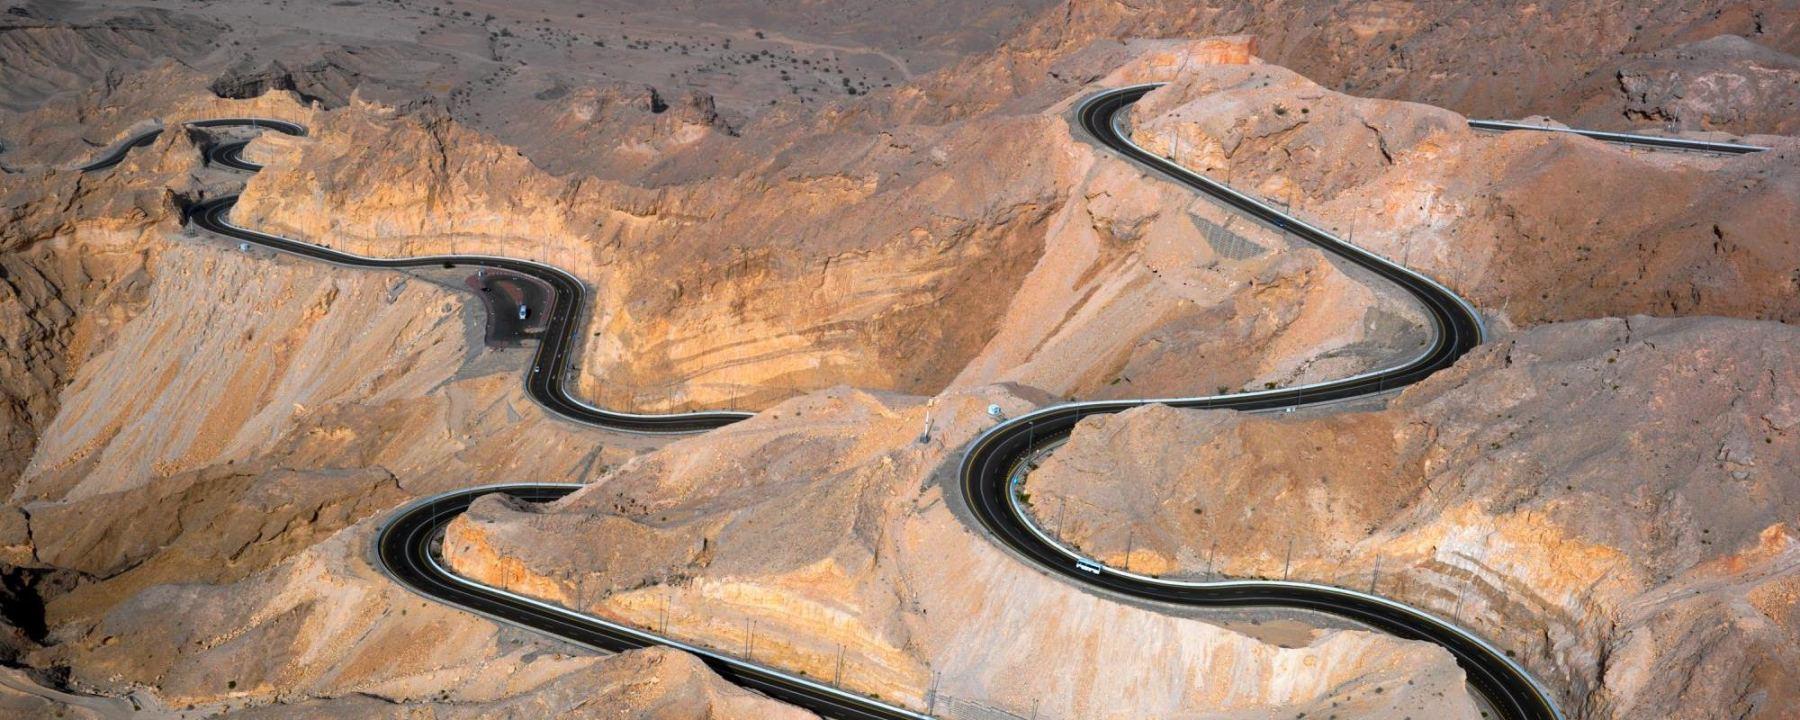 Jebel-Hafeet.jpg